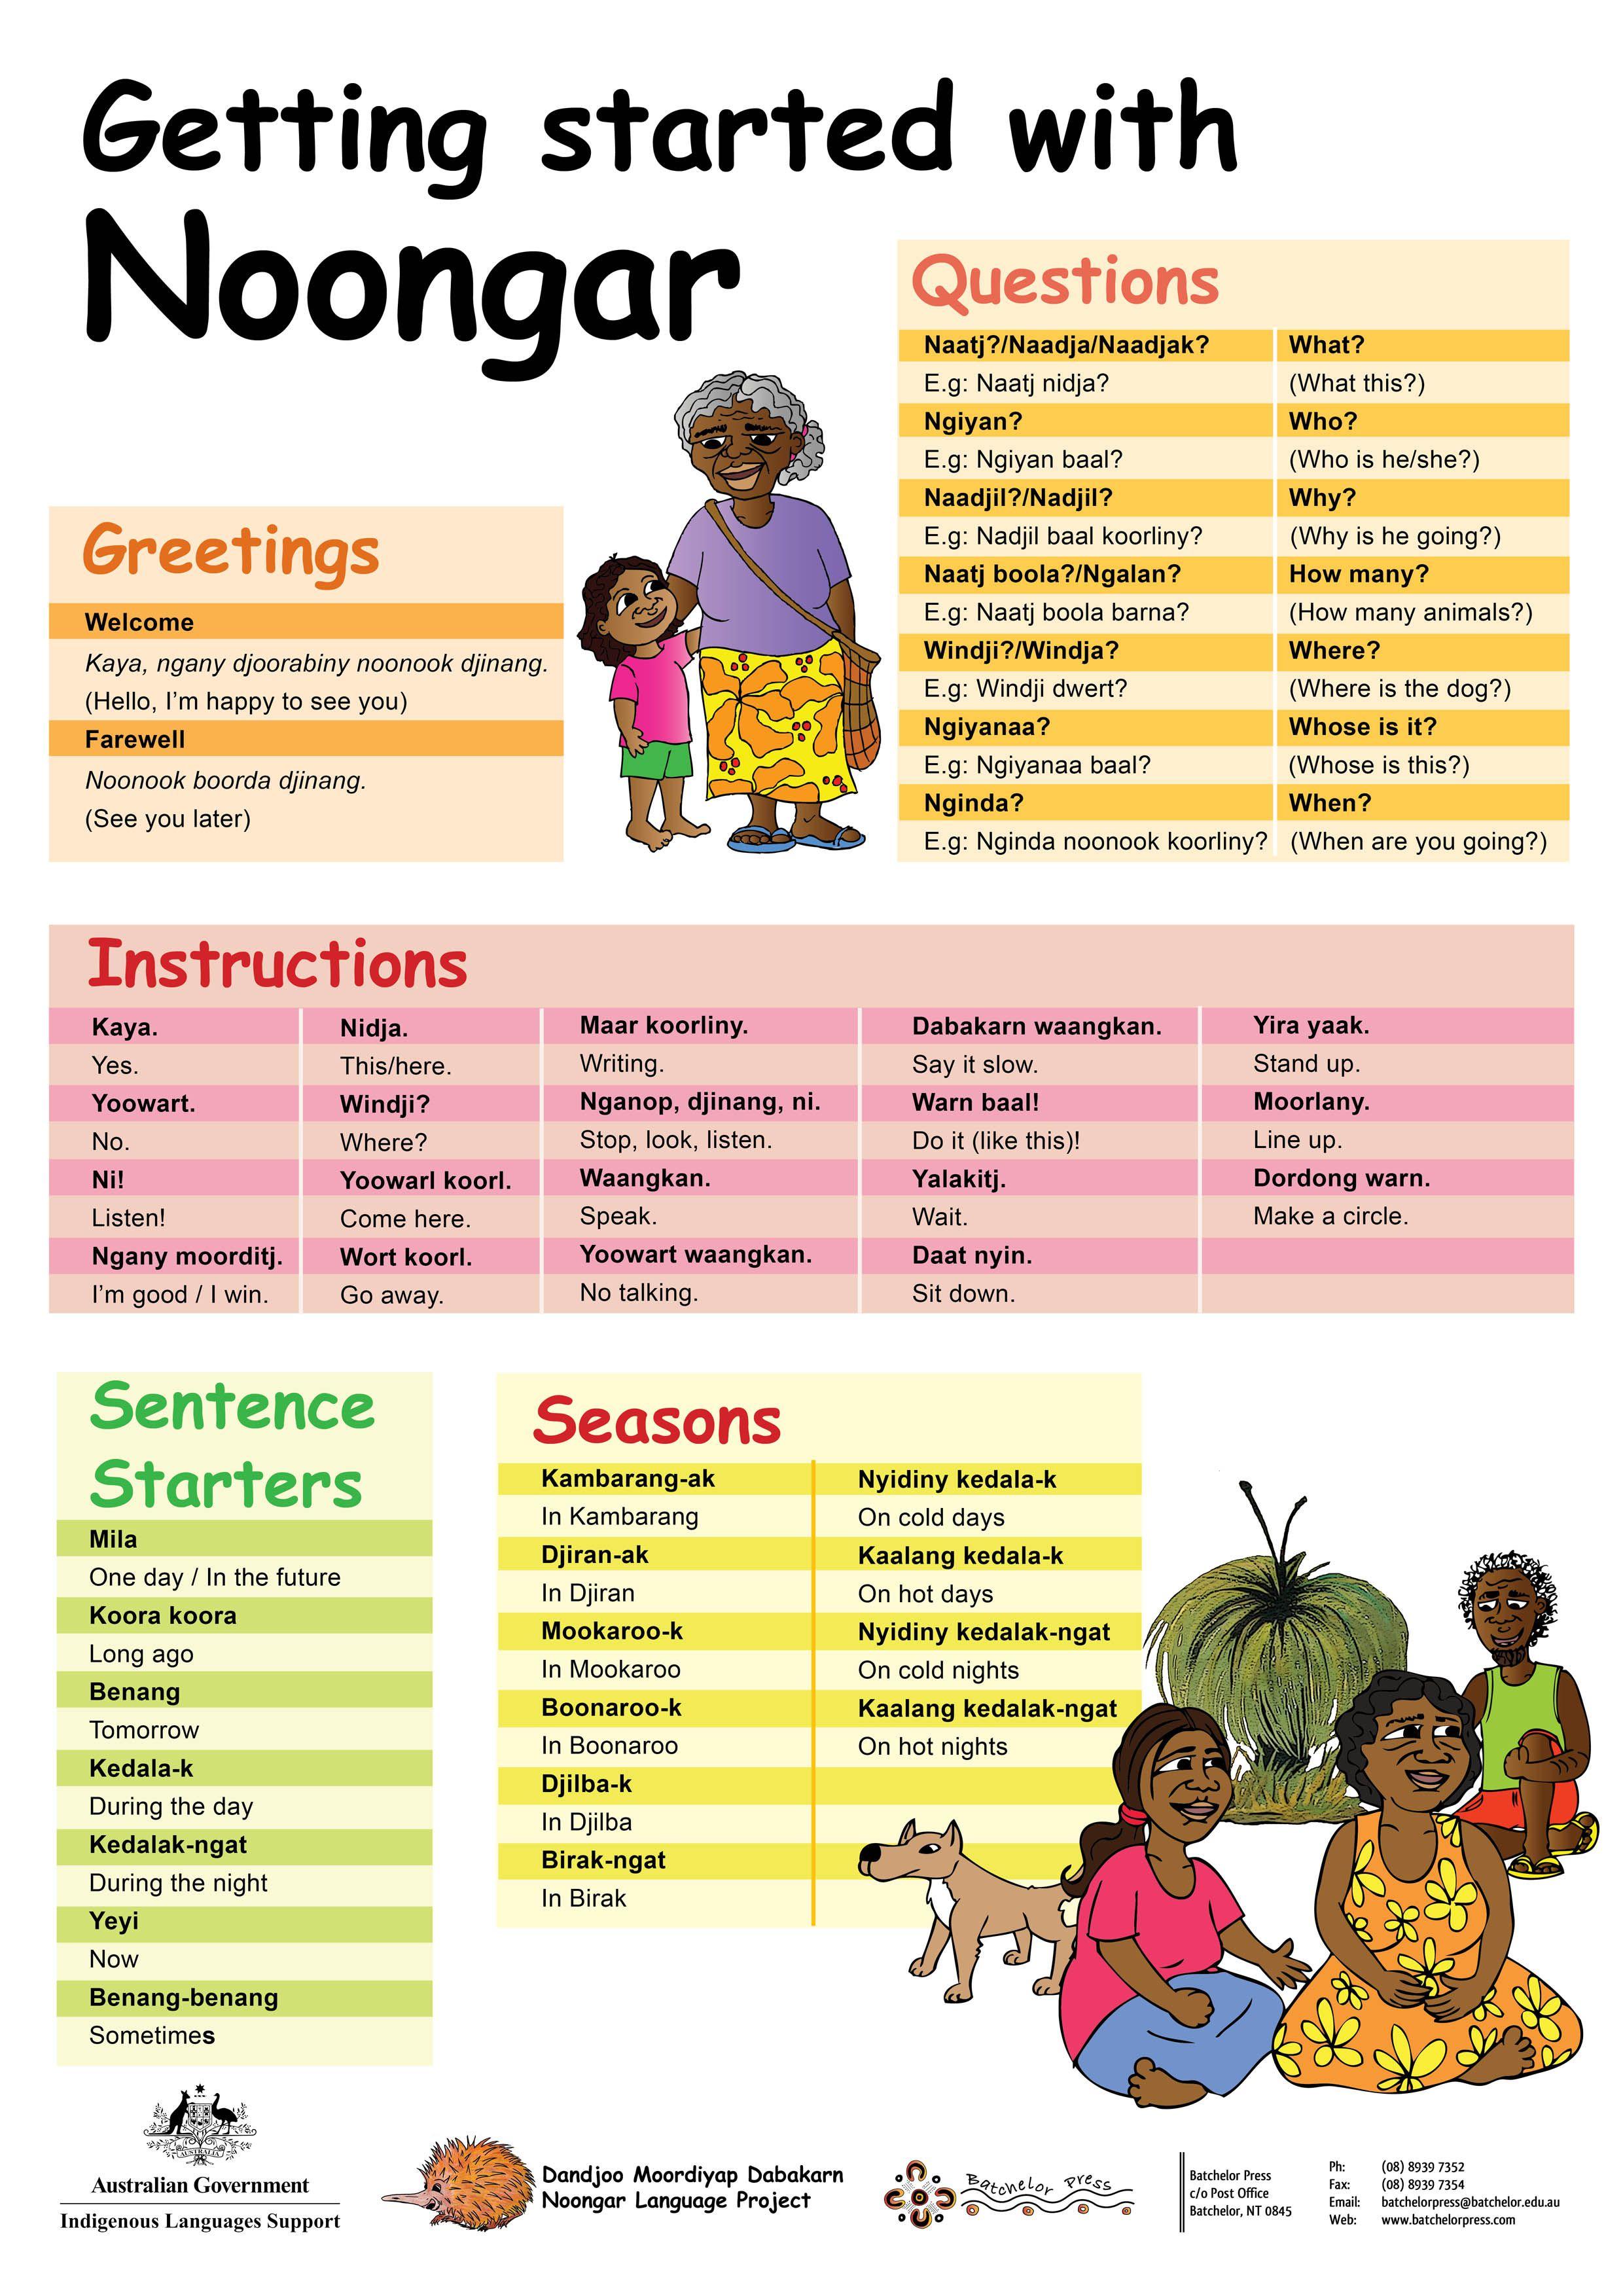 Noongar Language Project